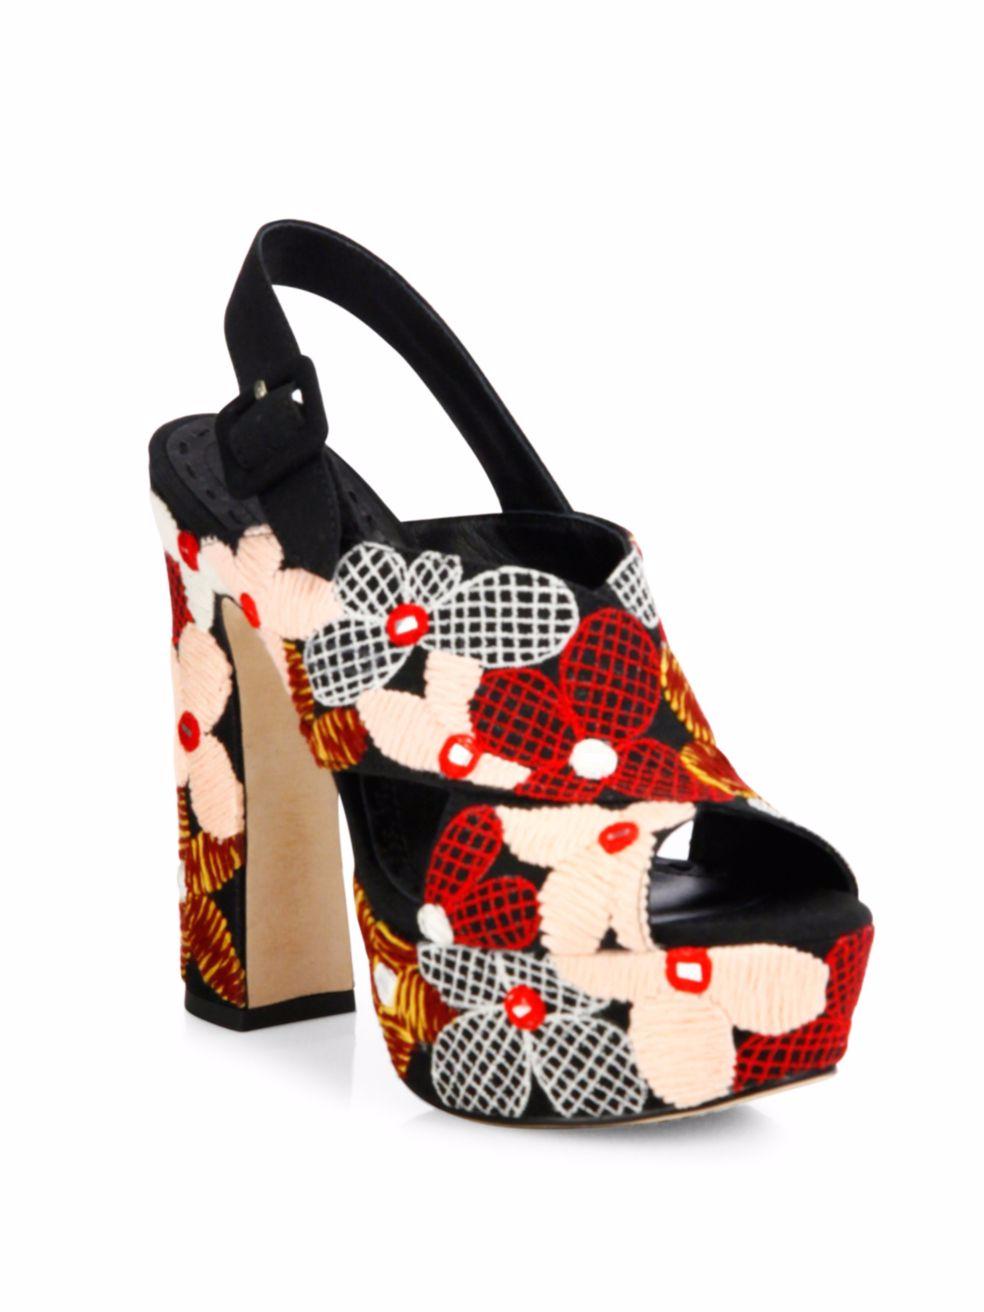 moda-cool-fashiontop5-ana-buendia-sandalias-estampadas.png